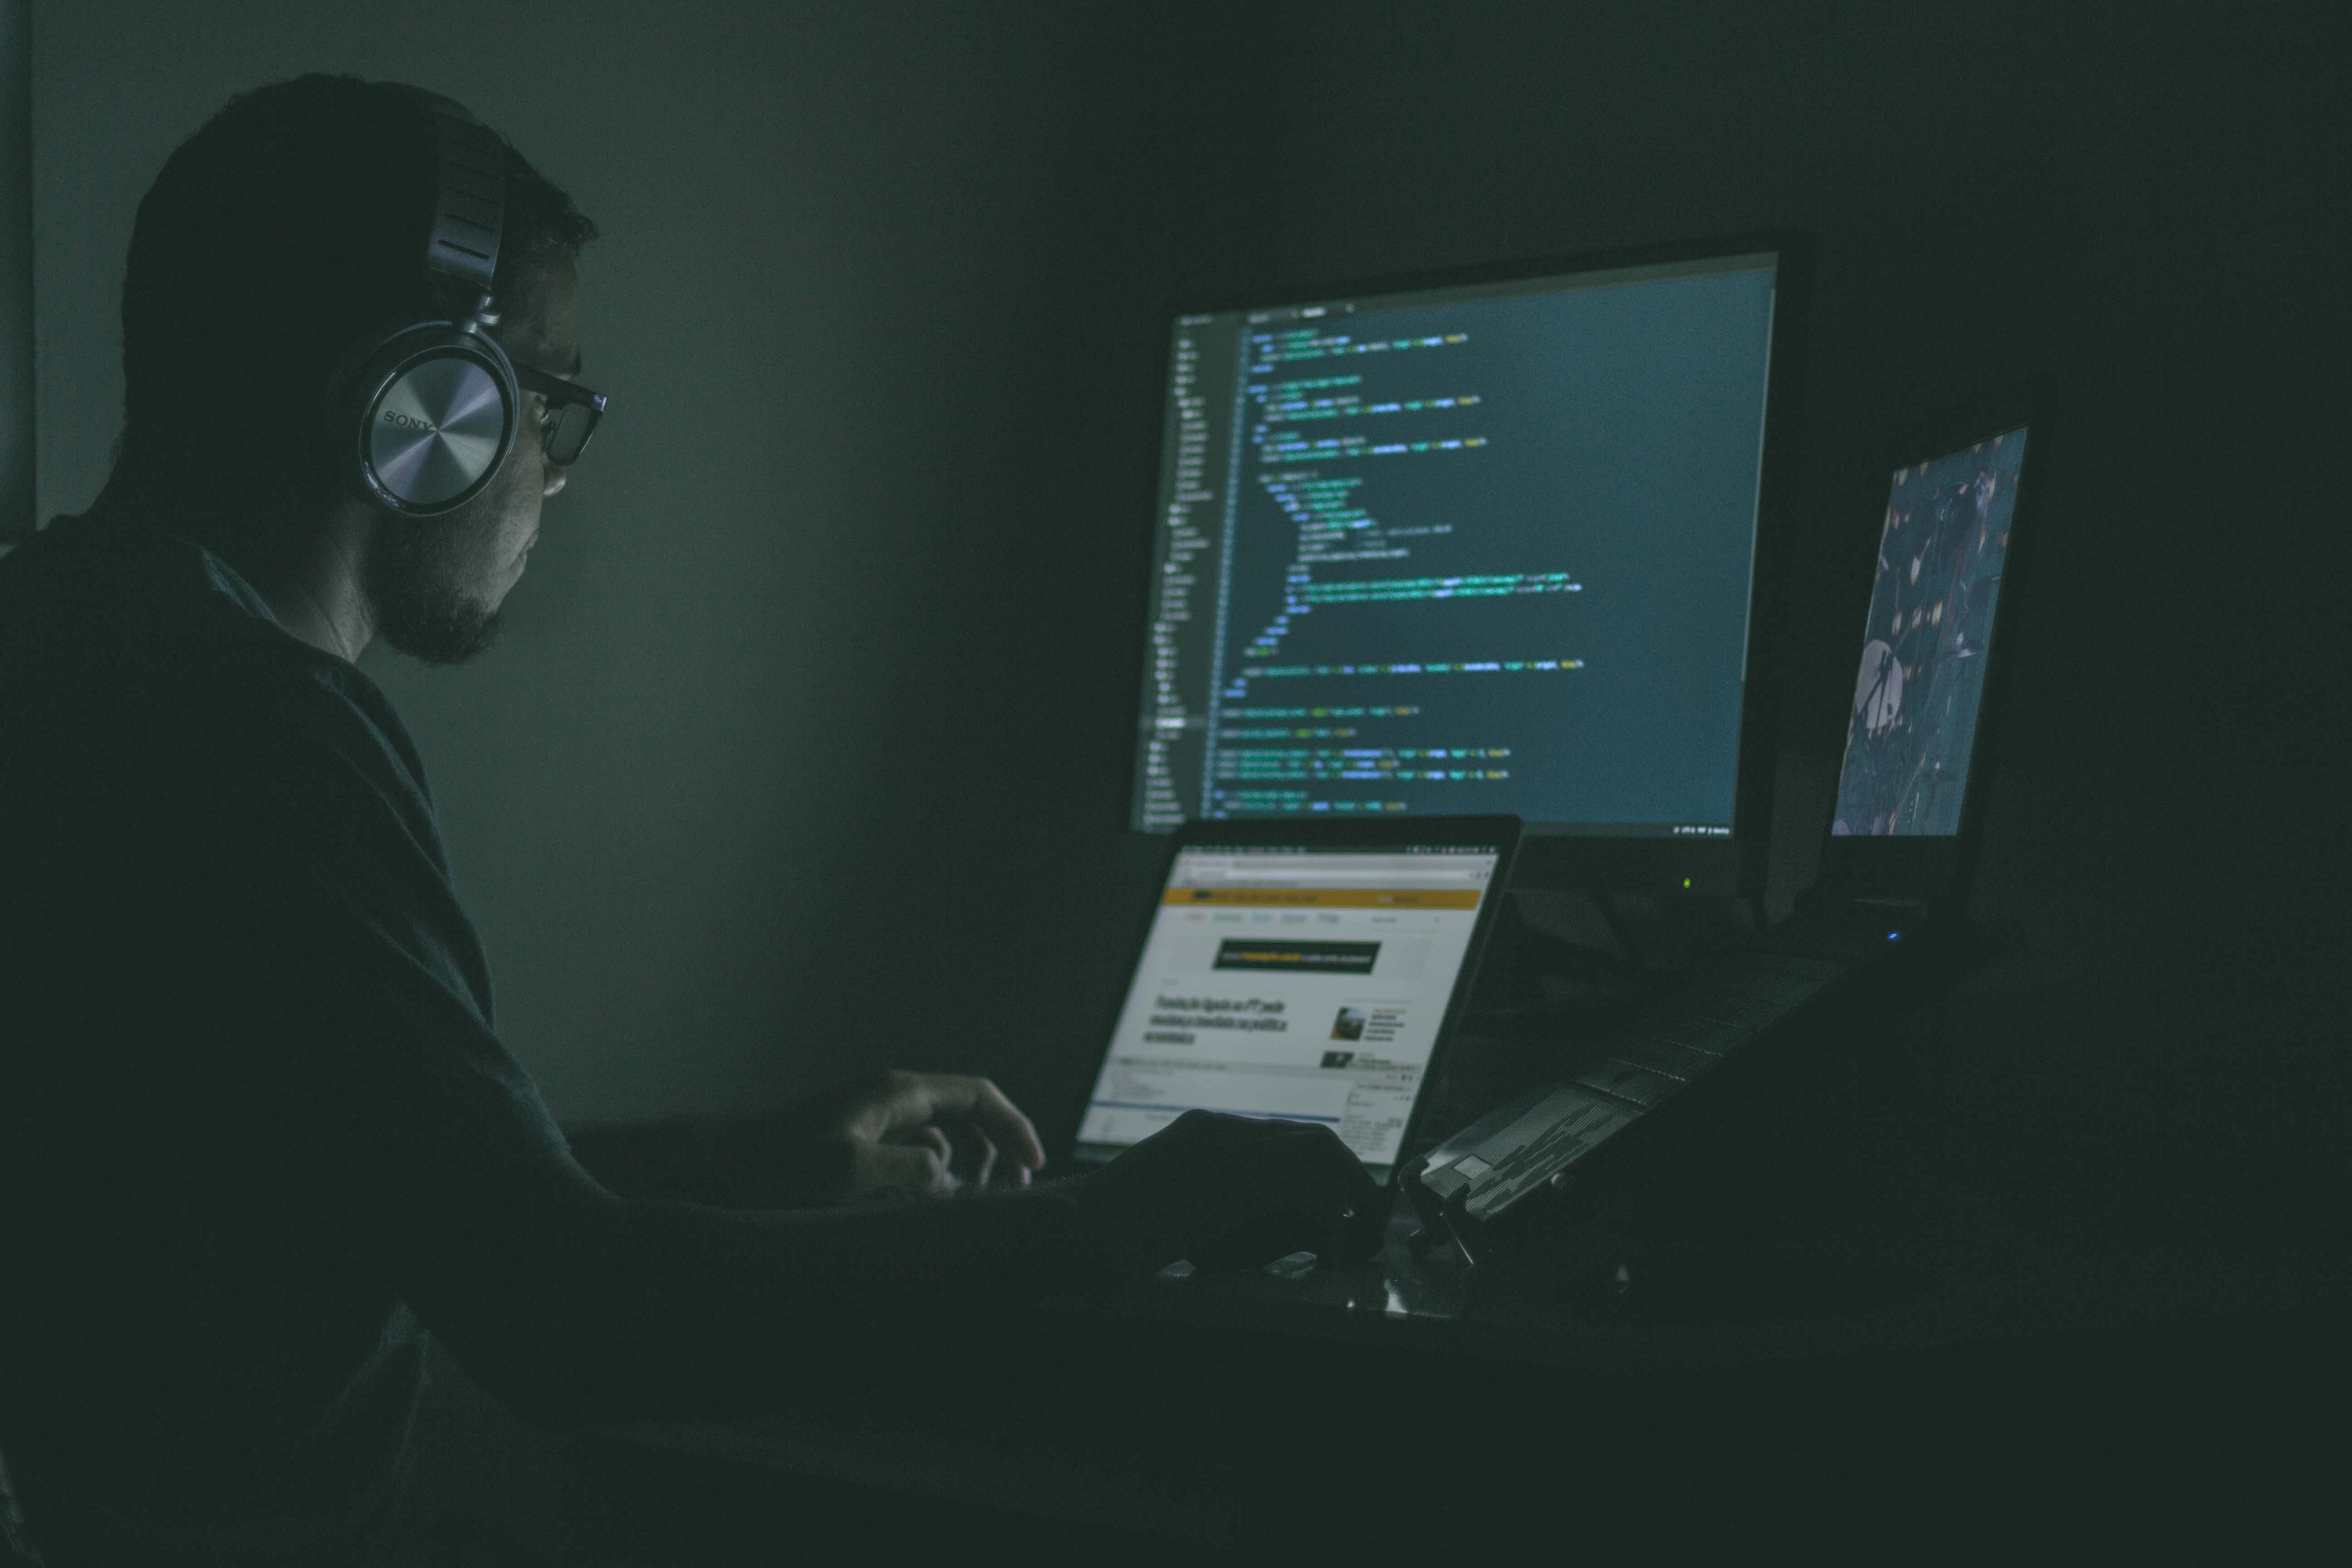 криптовалюта онлайн